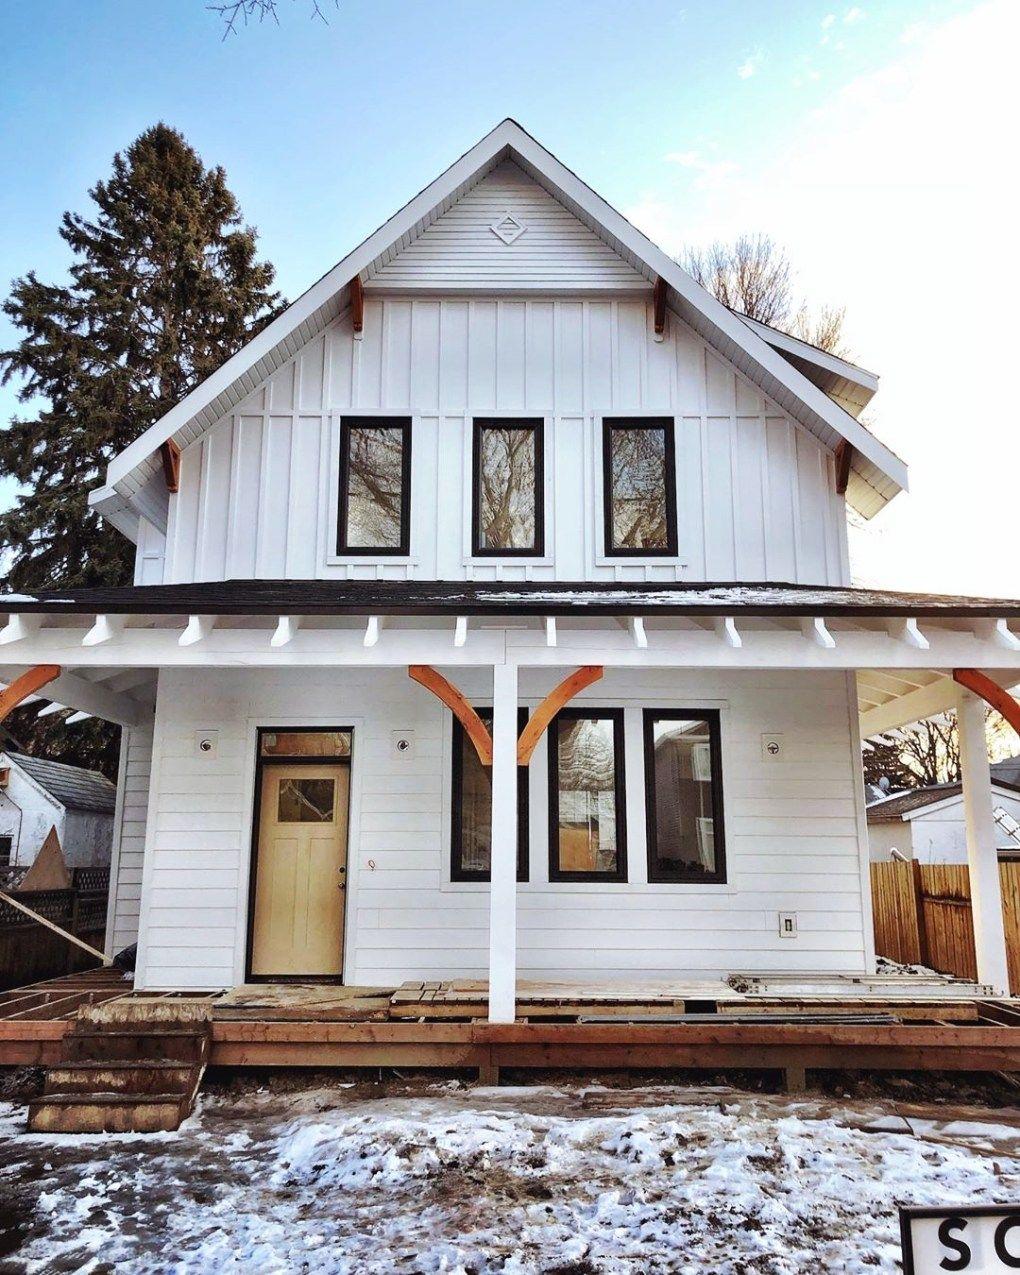 20 Best Farmhouse Exterior Ideas Board And Batten Siding Blog In 2020 Farmhouse Exterior Board And Batten Exterior House Exterior